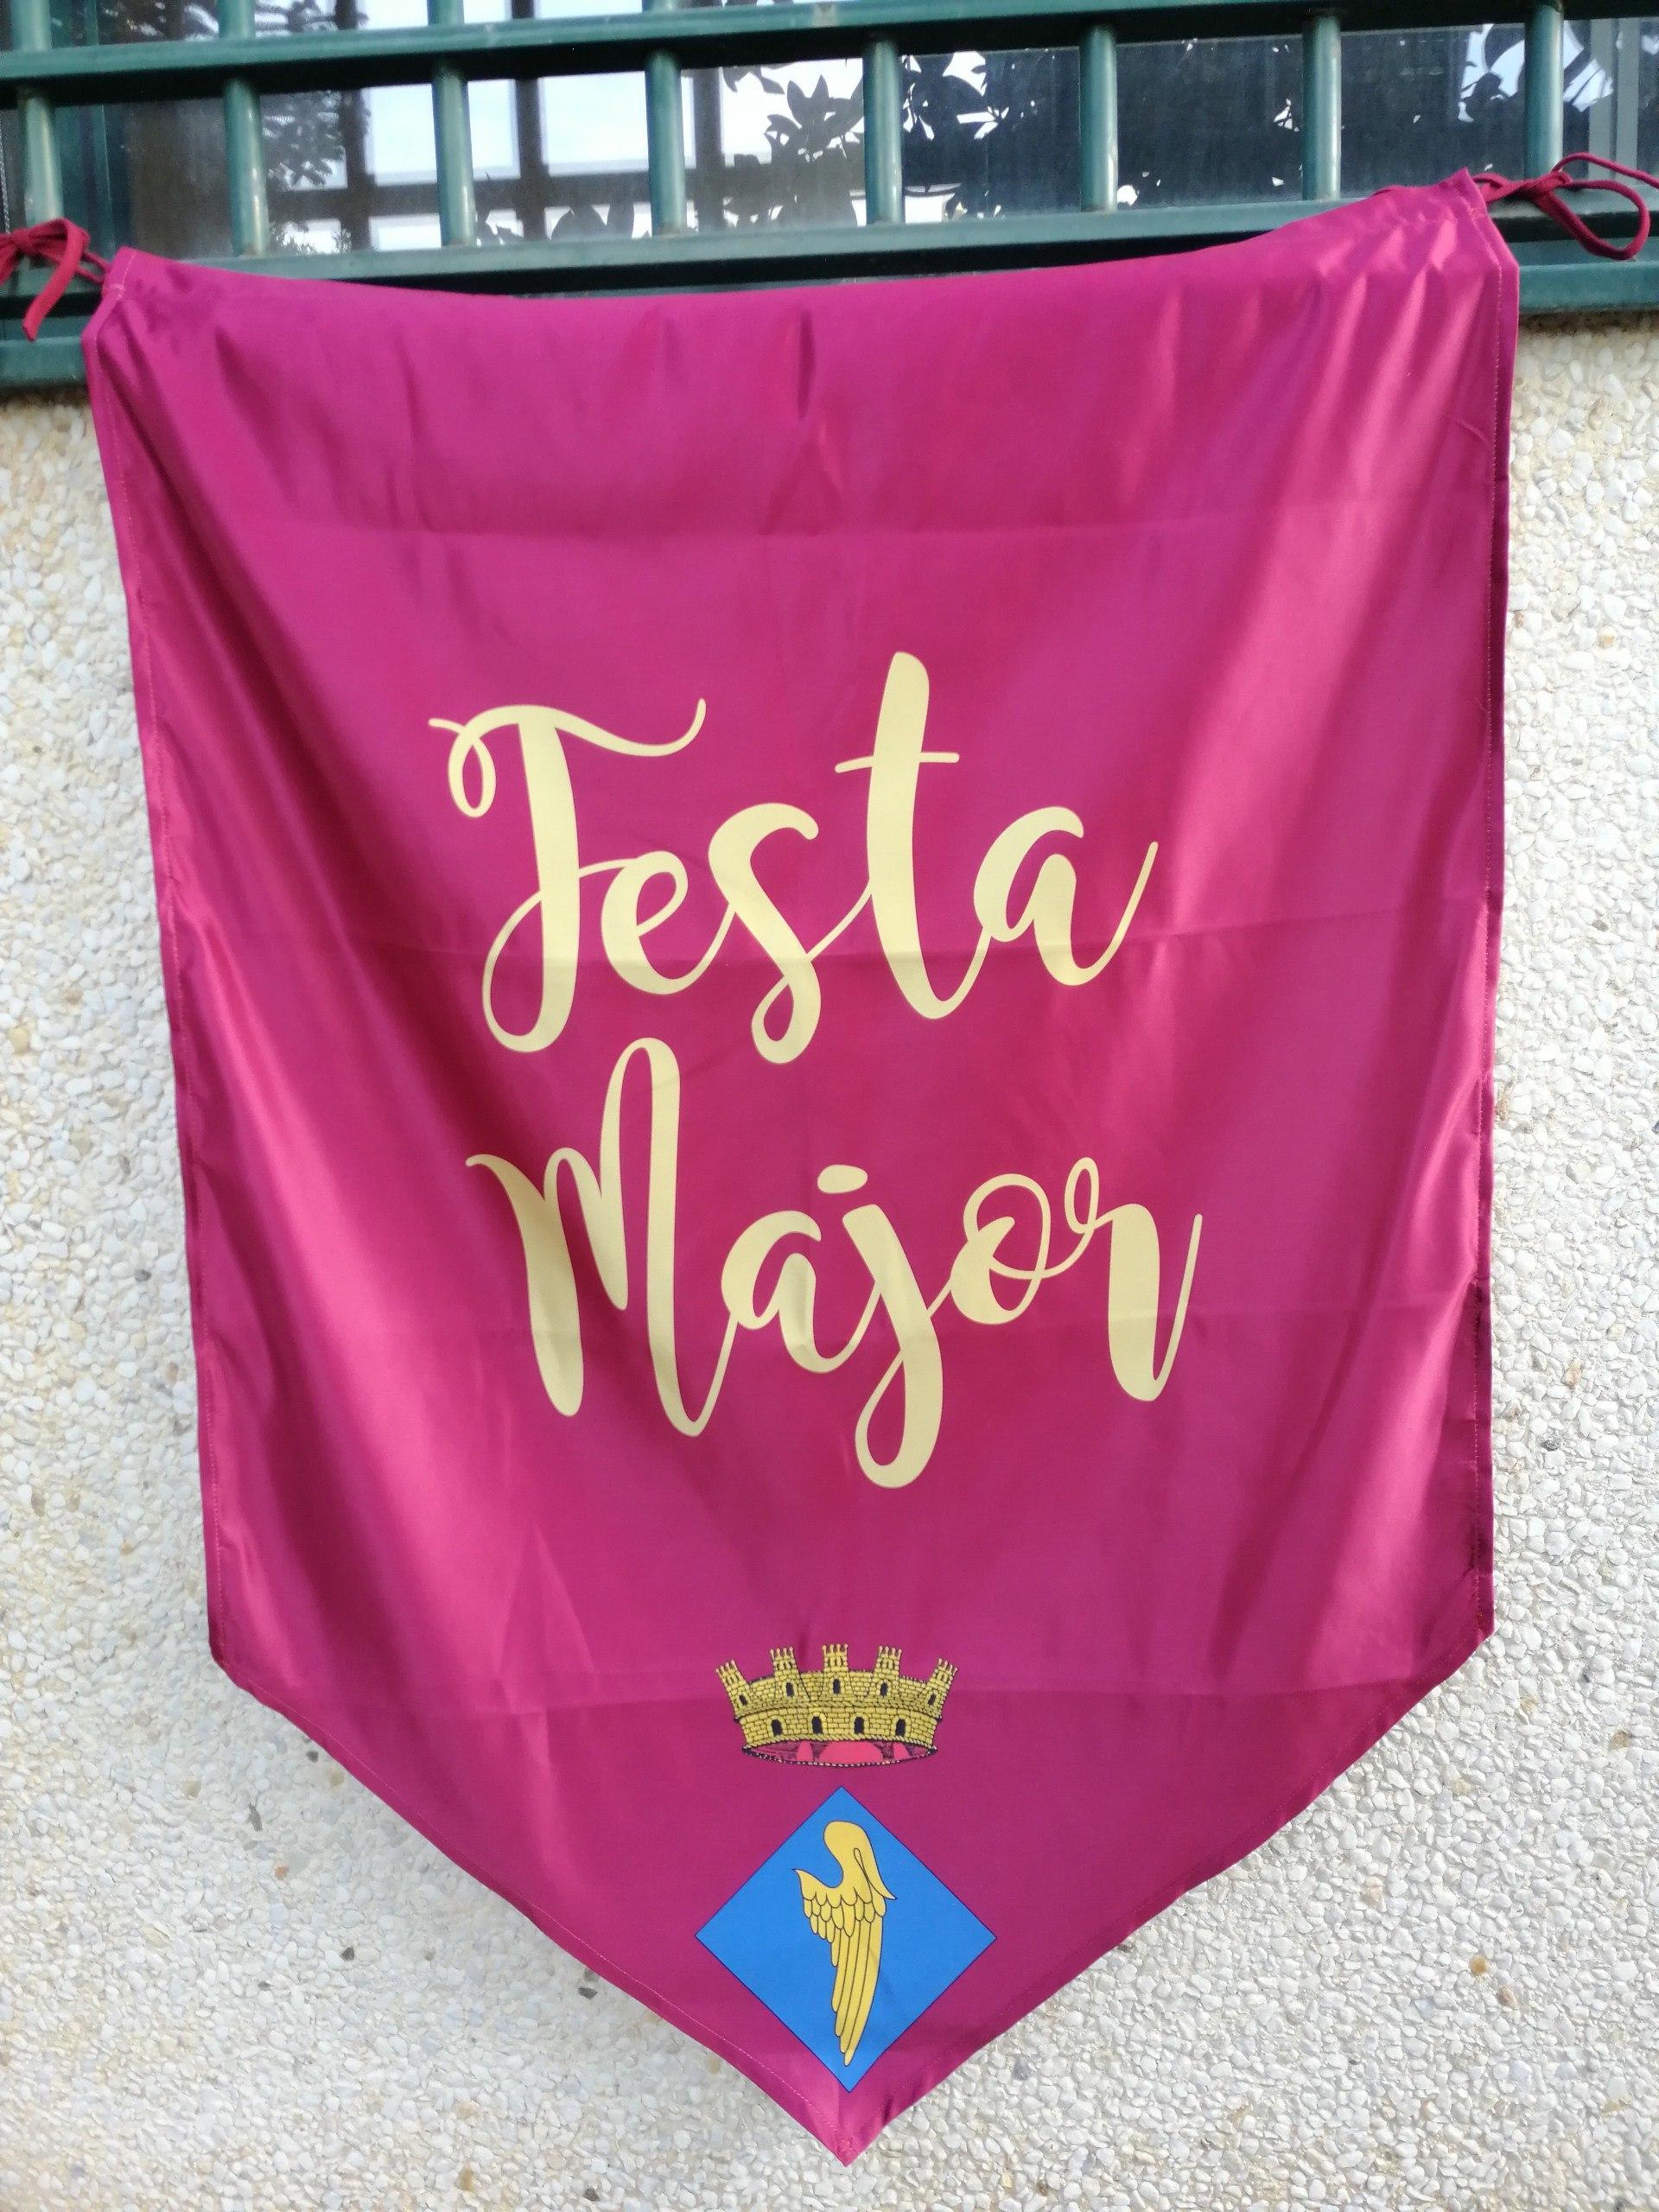 Domassos per festa major - Cavalle textil